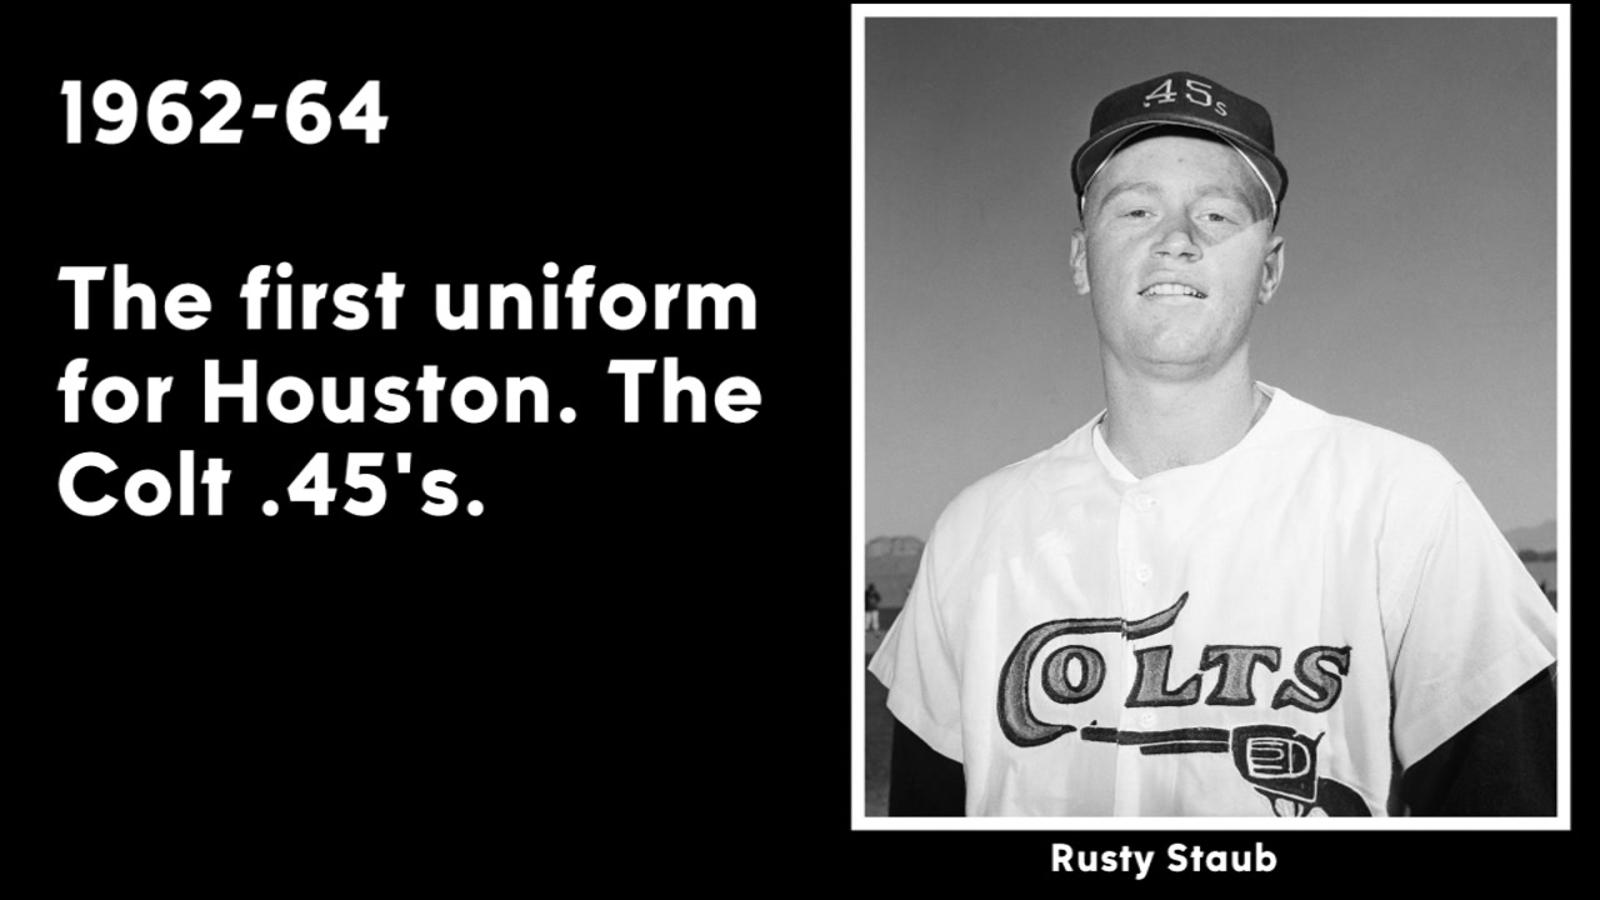 8b0916f07f1 Houston Astros uniform changes through the years